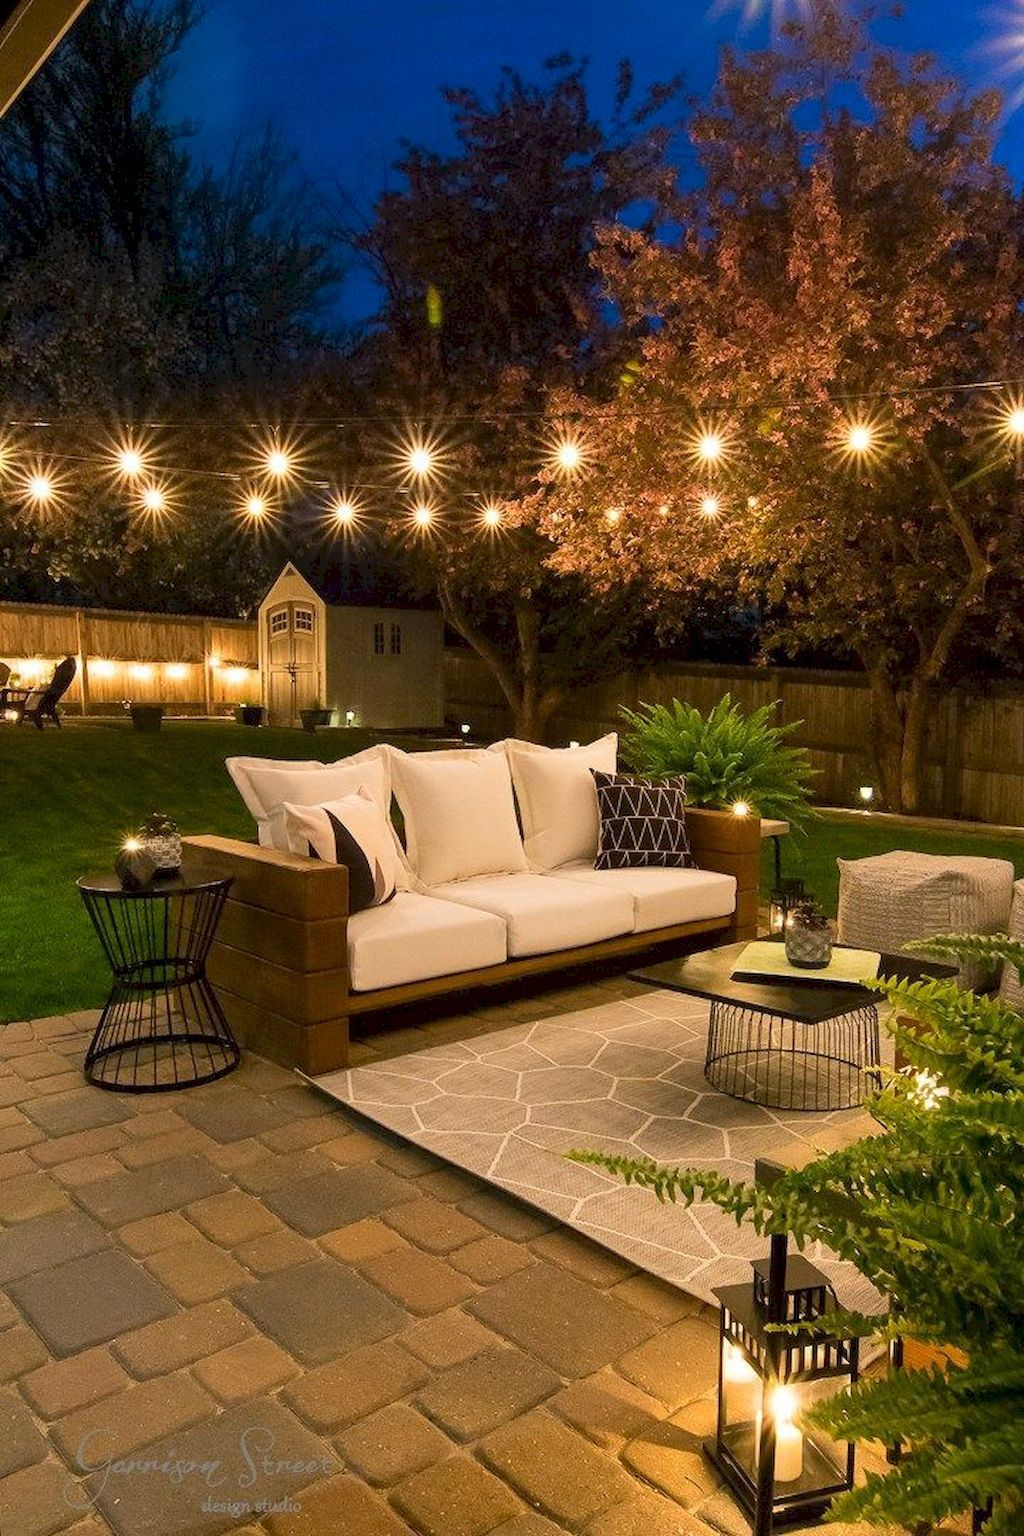 Outdoor Patio Lighting Ideas That Create A Good Vibe Outdoor Patio Decor Backyard Seating Modern Backyard